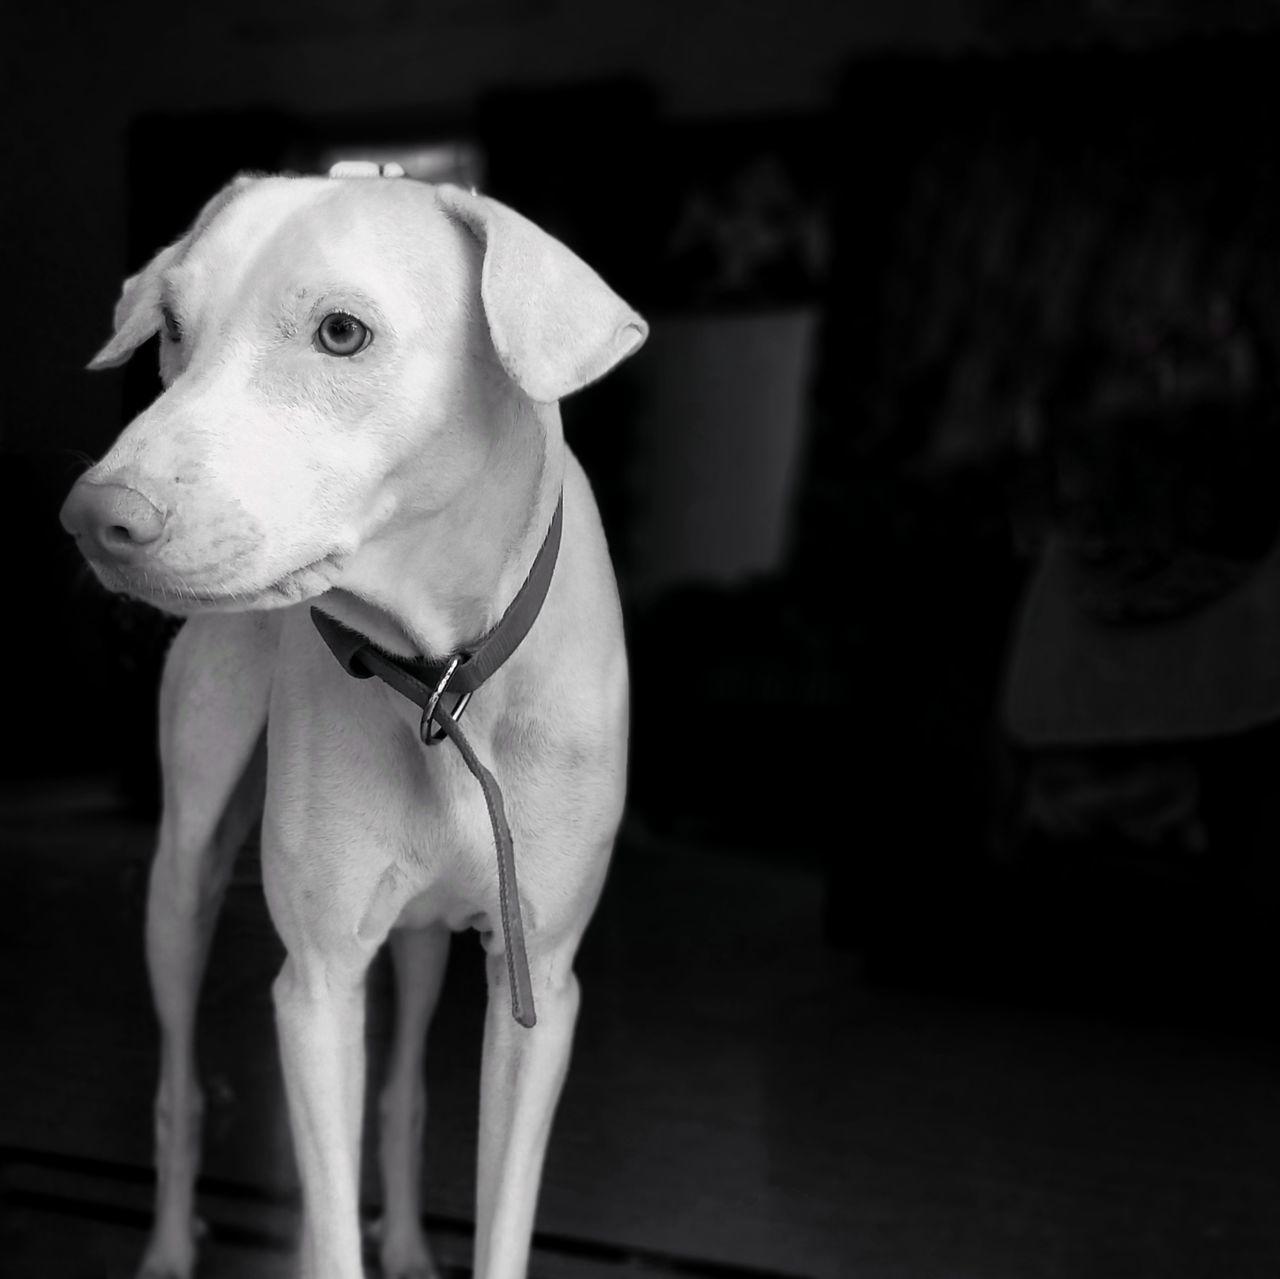 EyeEm Selects Dog Pets One Animal Domestic Animals Animal Themes Mammal Pet Clothing No People Day Outdoors Dogs Dogs Of EyeEm Dogslife Black & White Bnw Blackandwhite India Monochrome